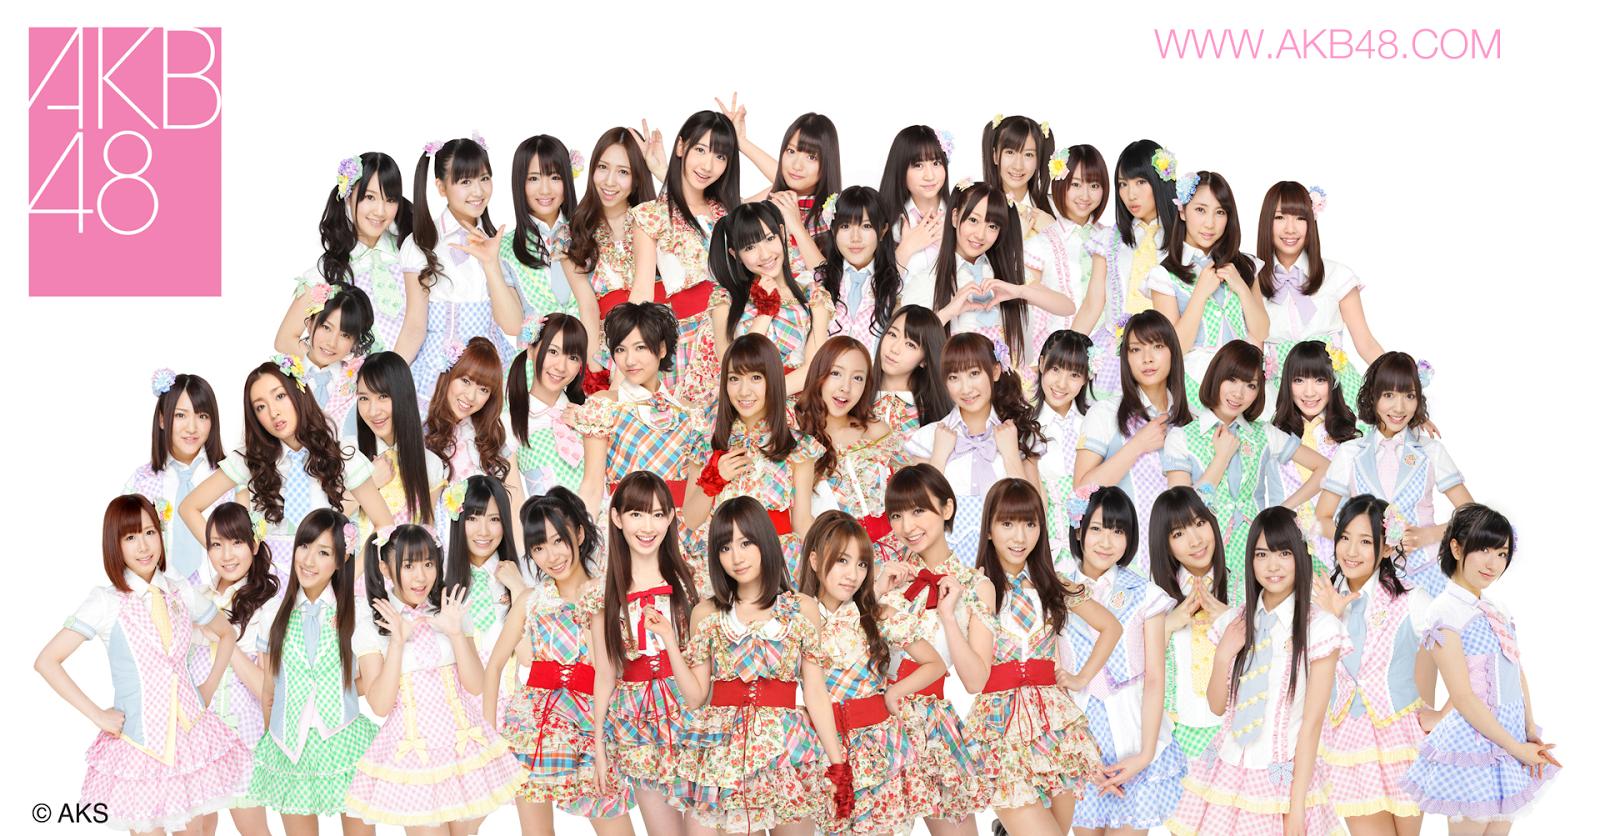 AKB48 Group